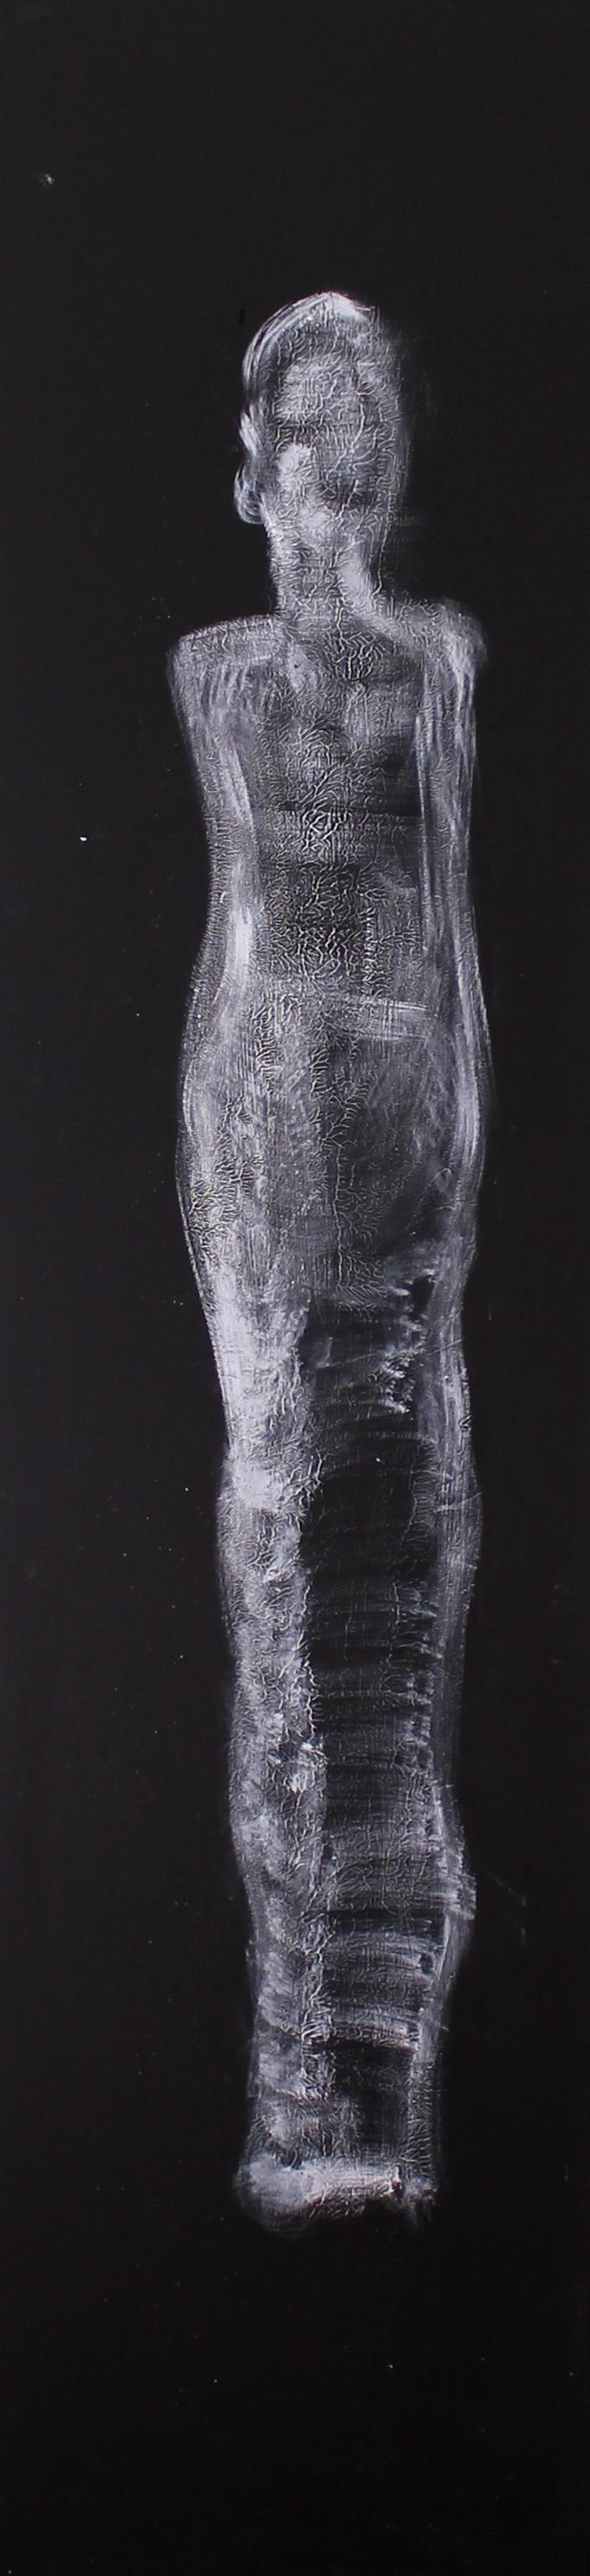 Ombre 40x180-2012.jpg